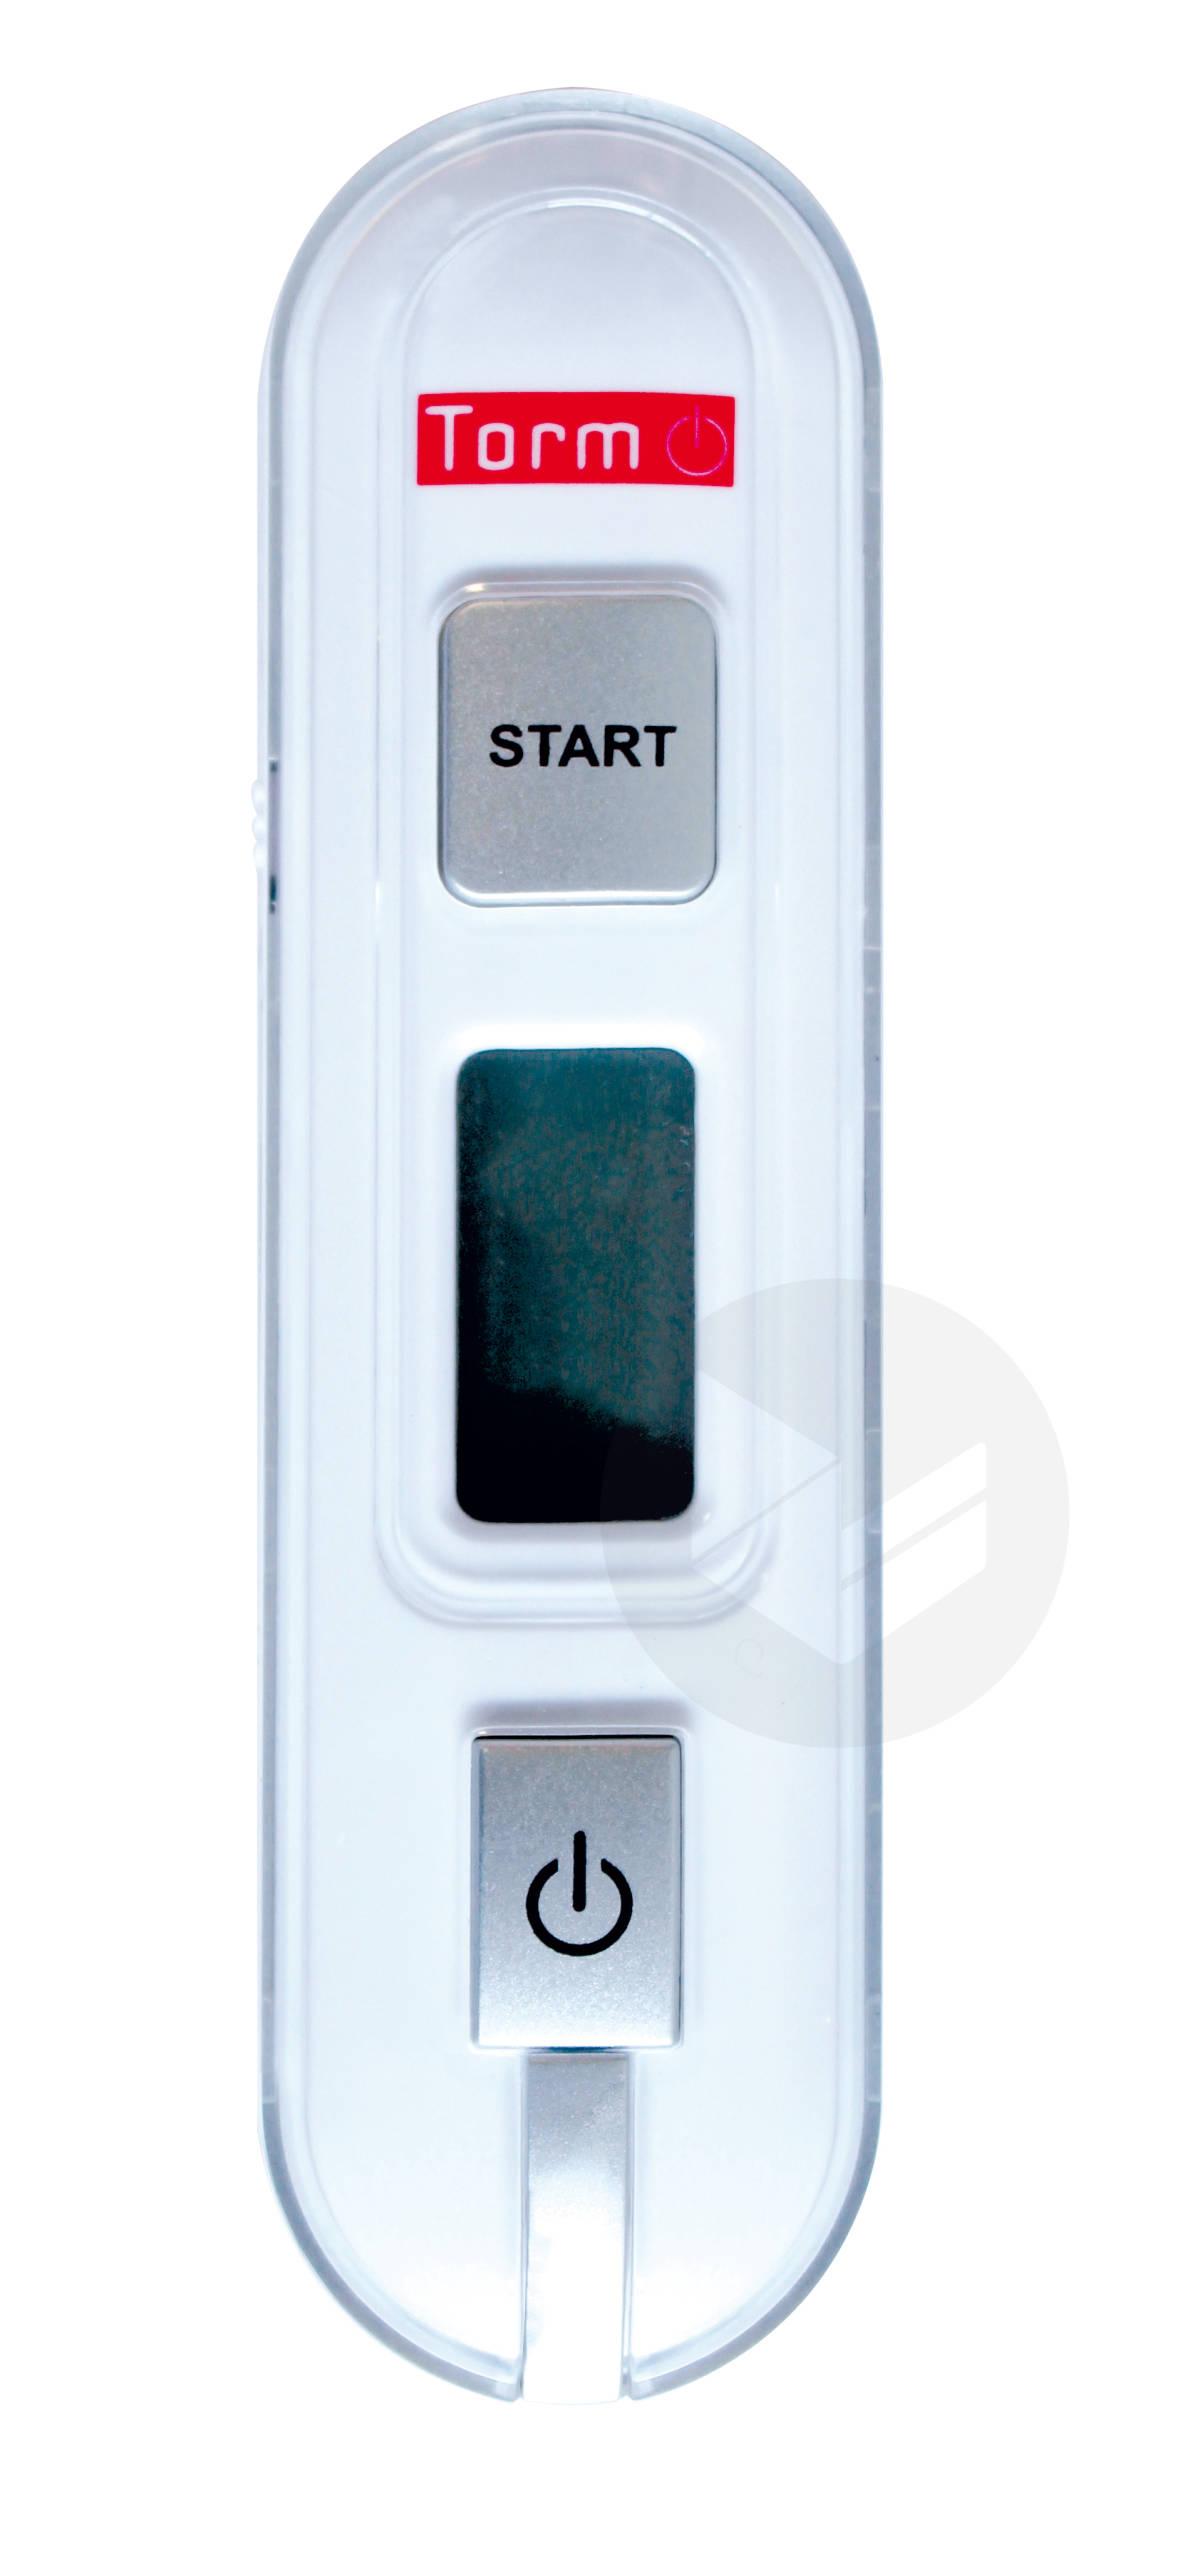 Torm Thermometre Sans Contact Sc 02